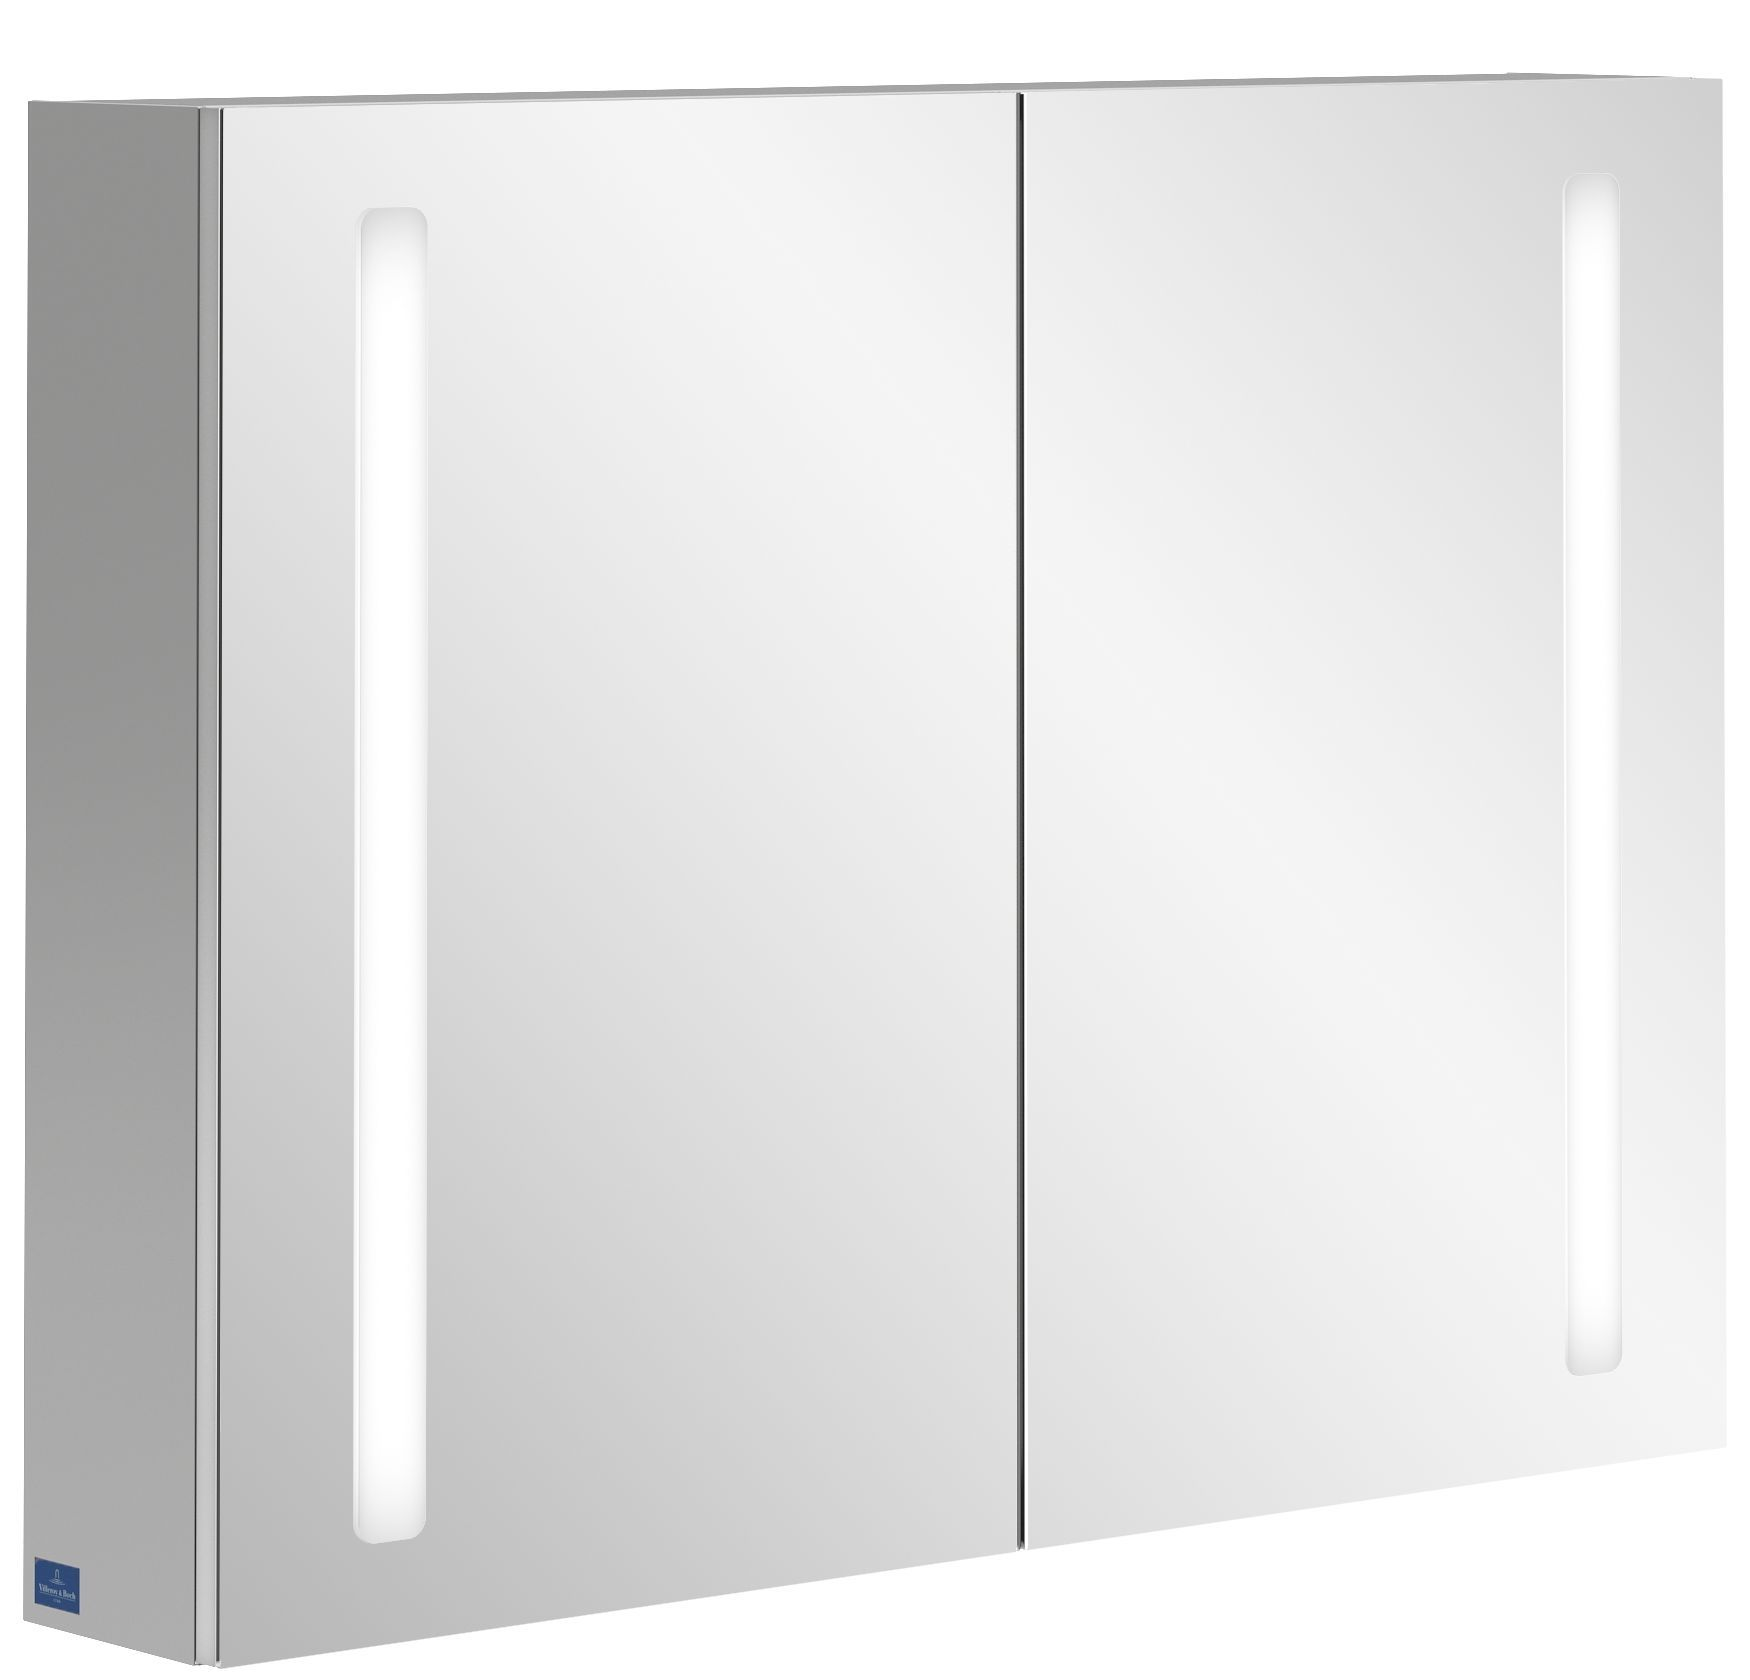 Villeroy & Boch My View 14 Spiegelschrank mit LED-Beleuchtung B: 80 cm A4218000